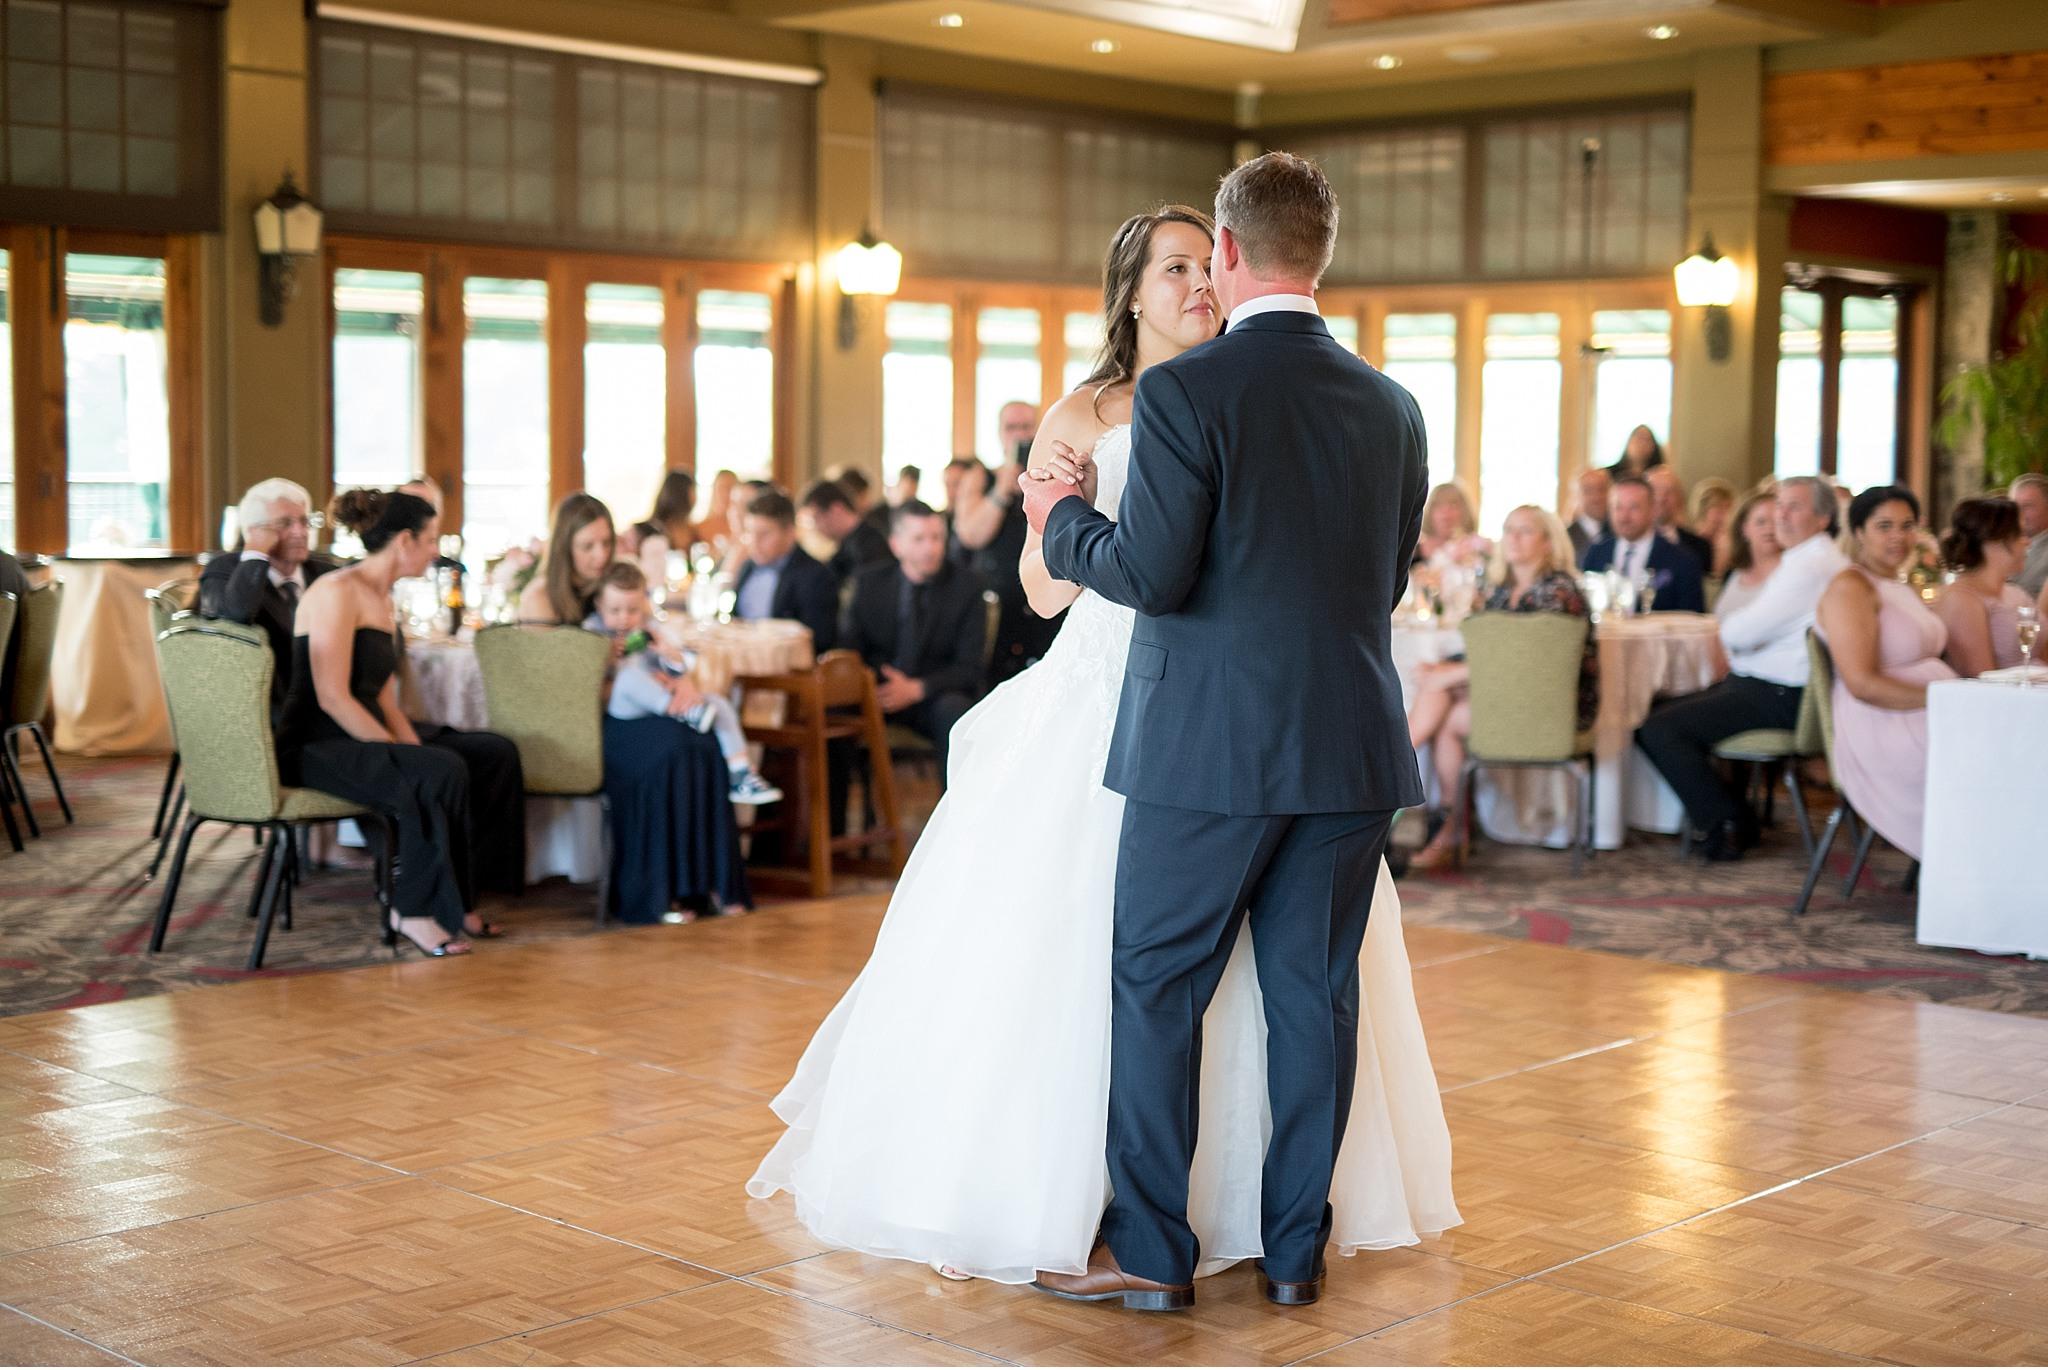 Bride and groom first dance Hershey Gardens Hershey Country Club Summer beautiful wedding photography_1618.jpg